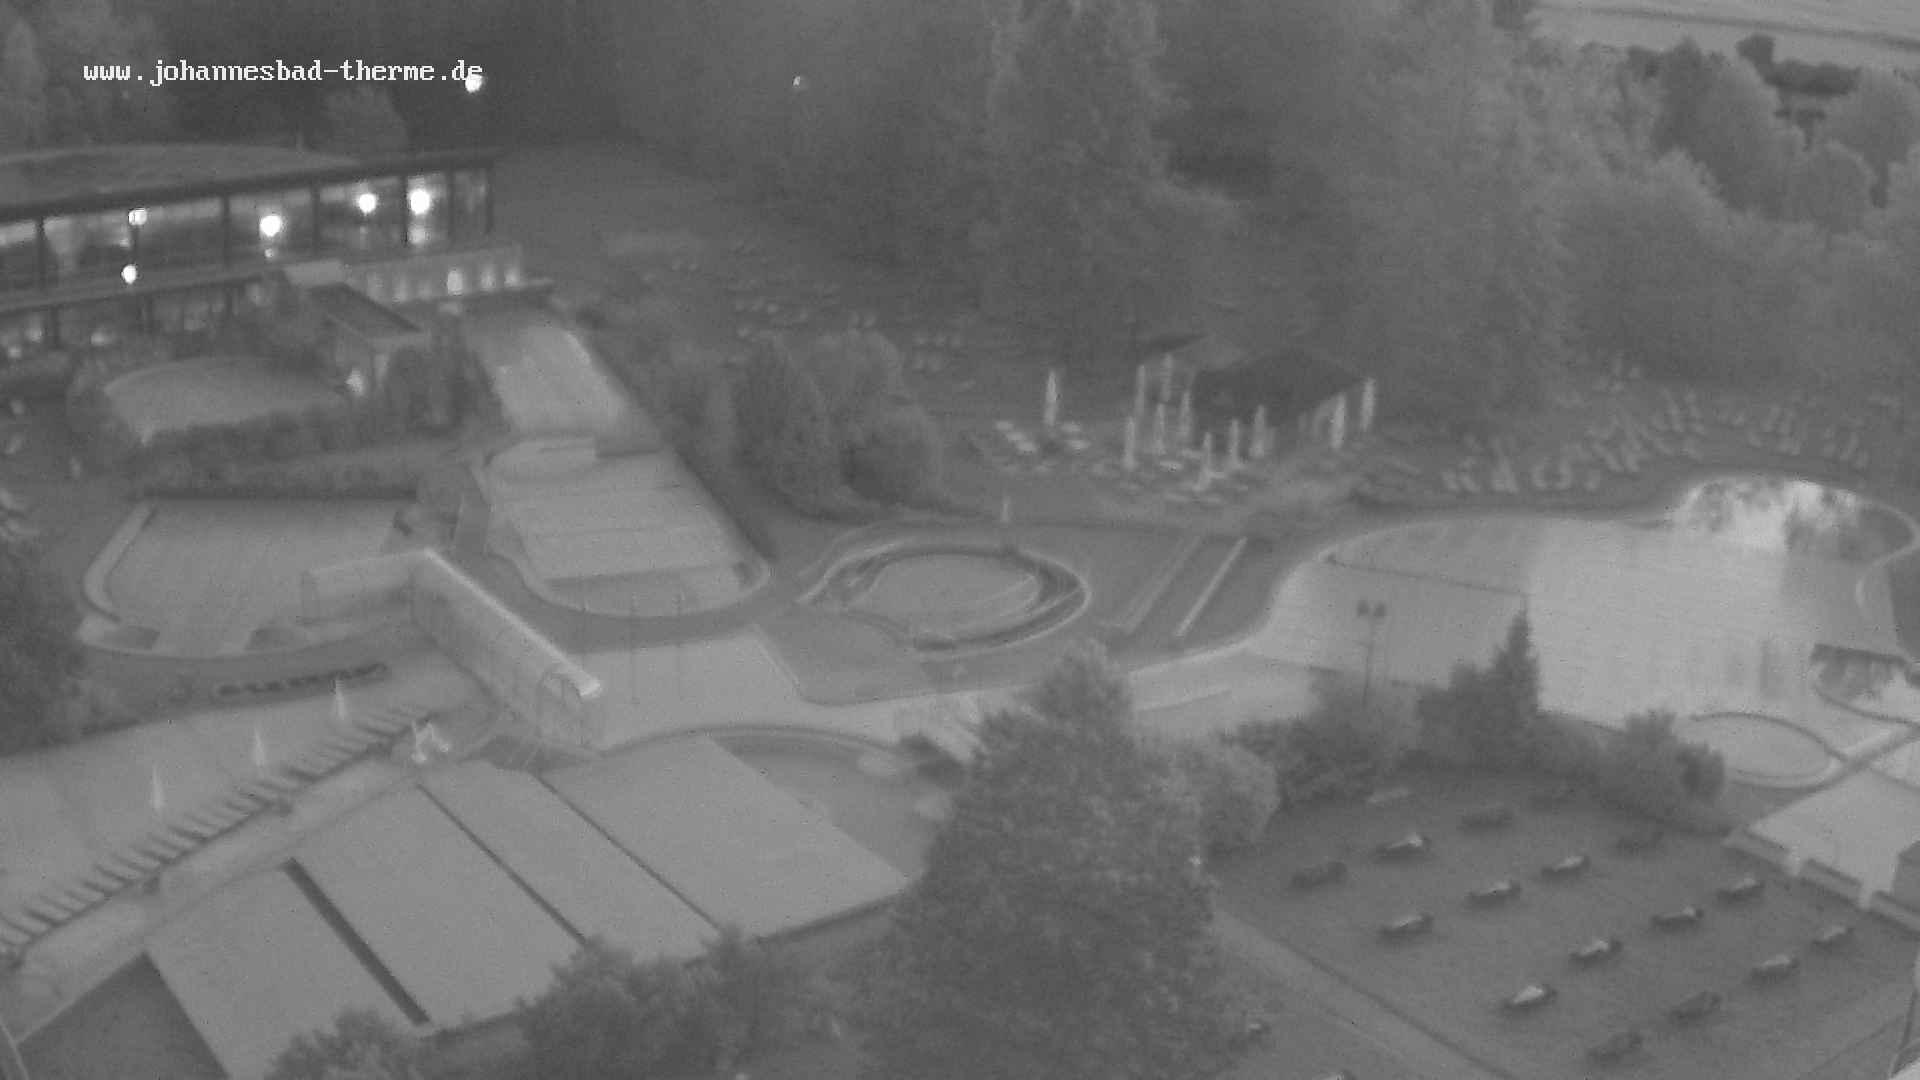 Johannesbad Webcam